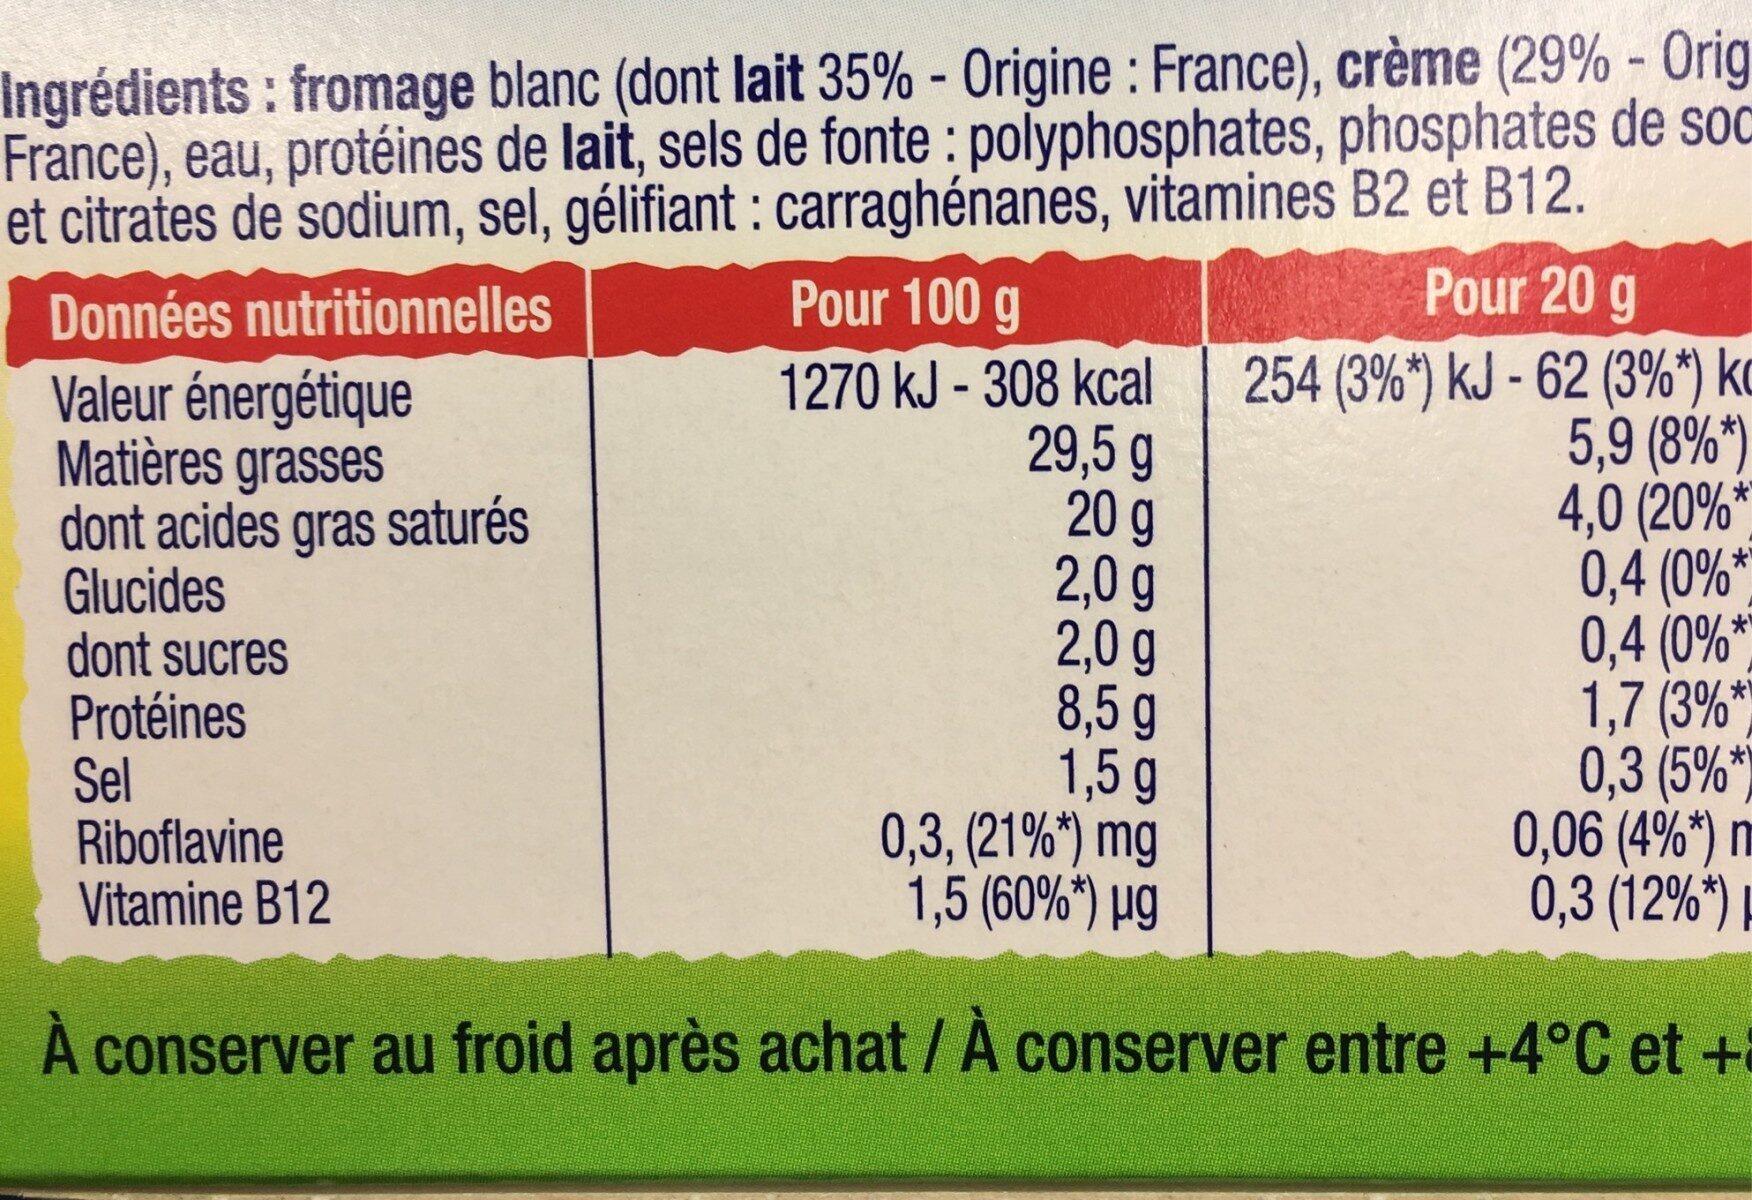 choubidou à la crème - Informació nutricional - fr